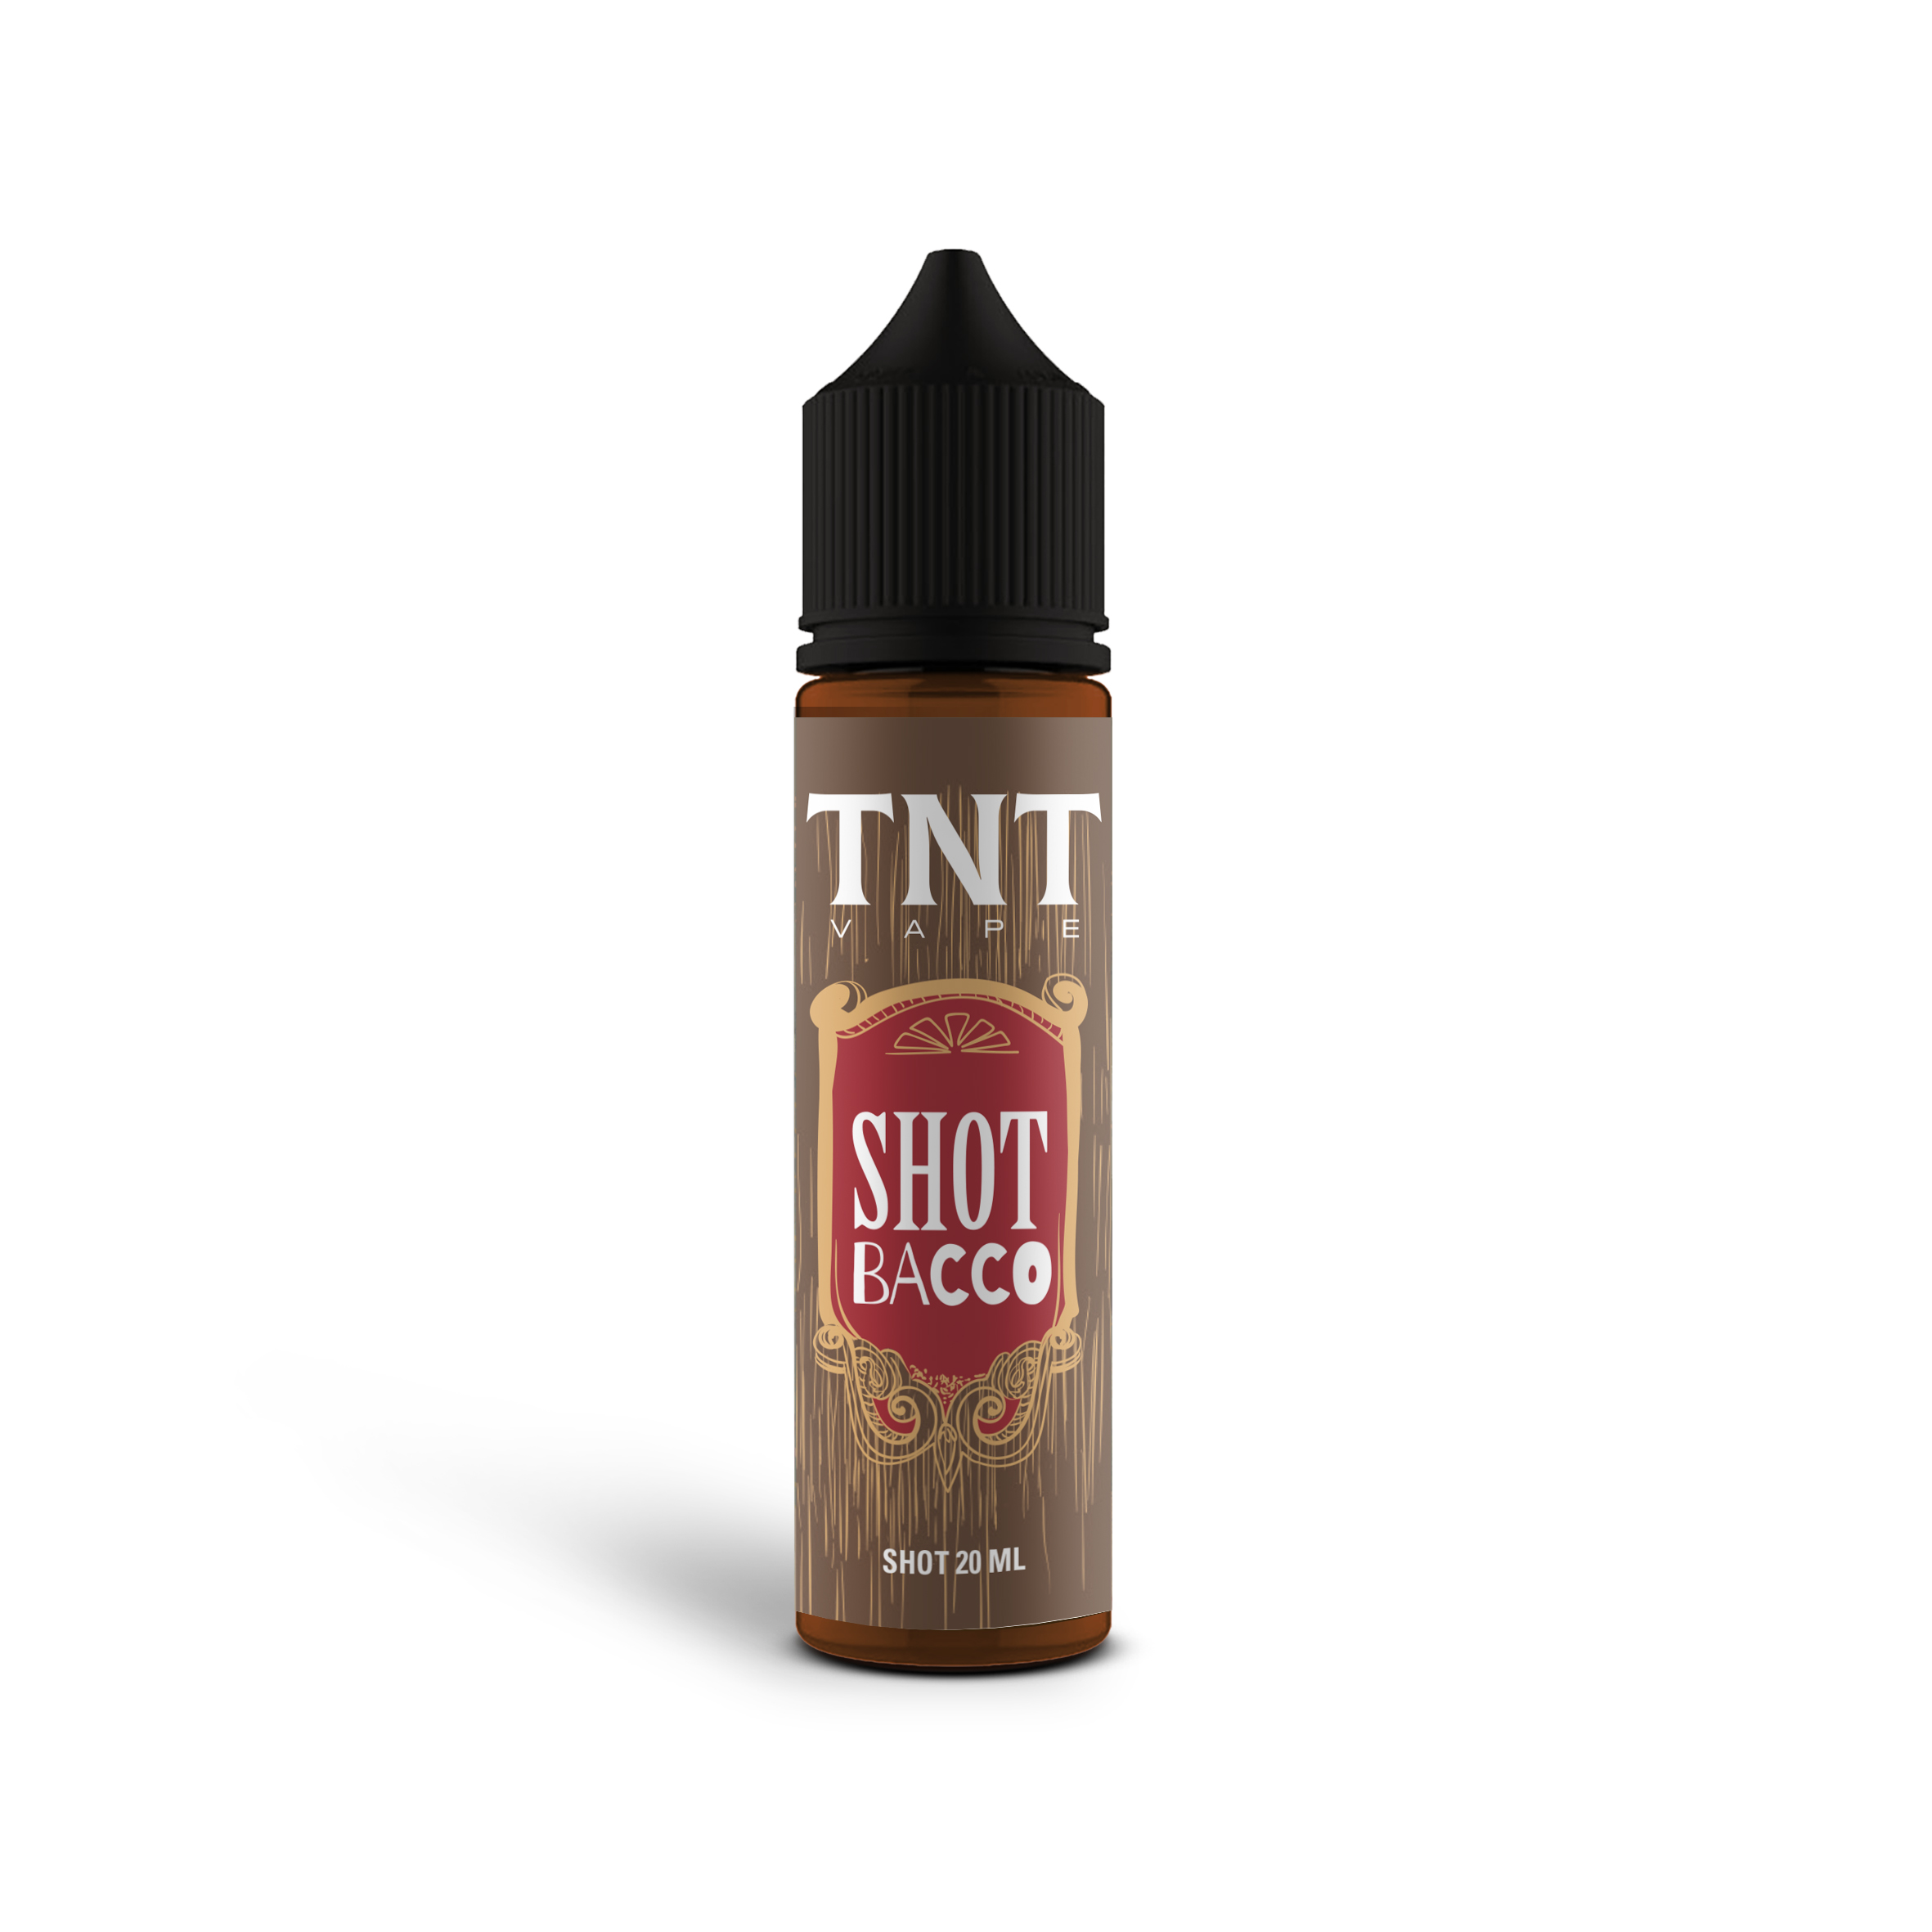 Tnt Vape Shot Bacco Aroma Istantaneo 20ml